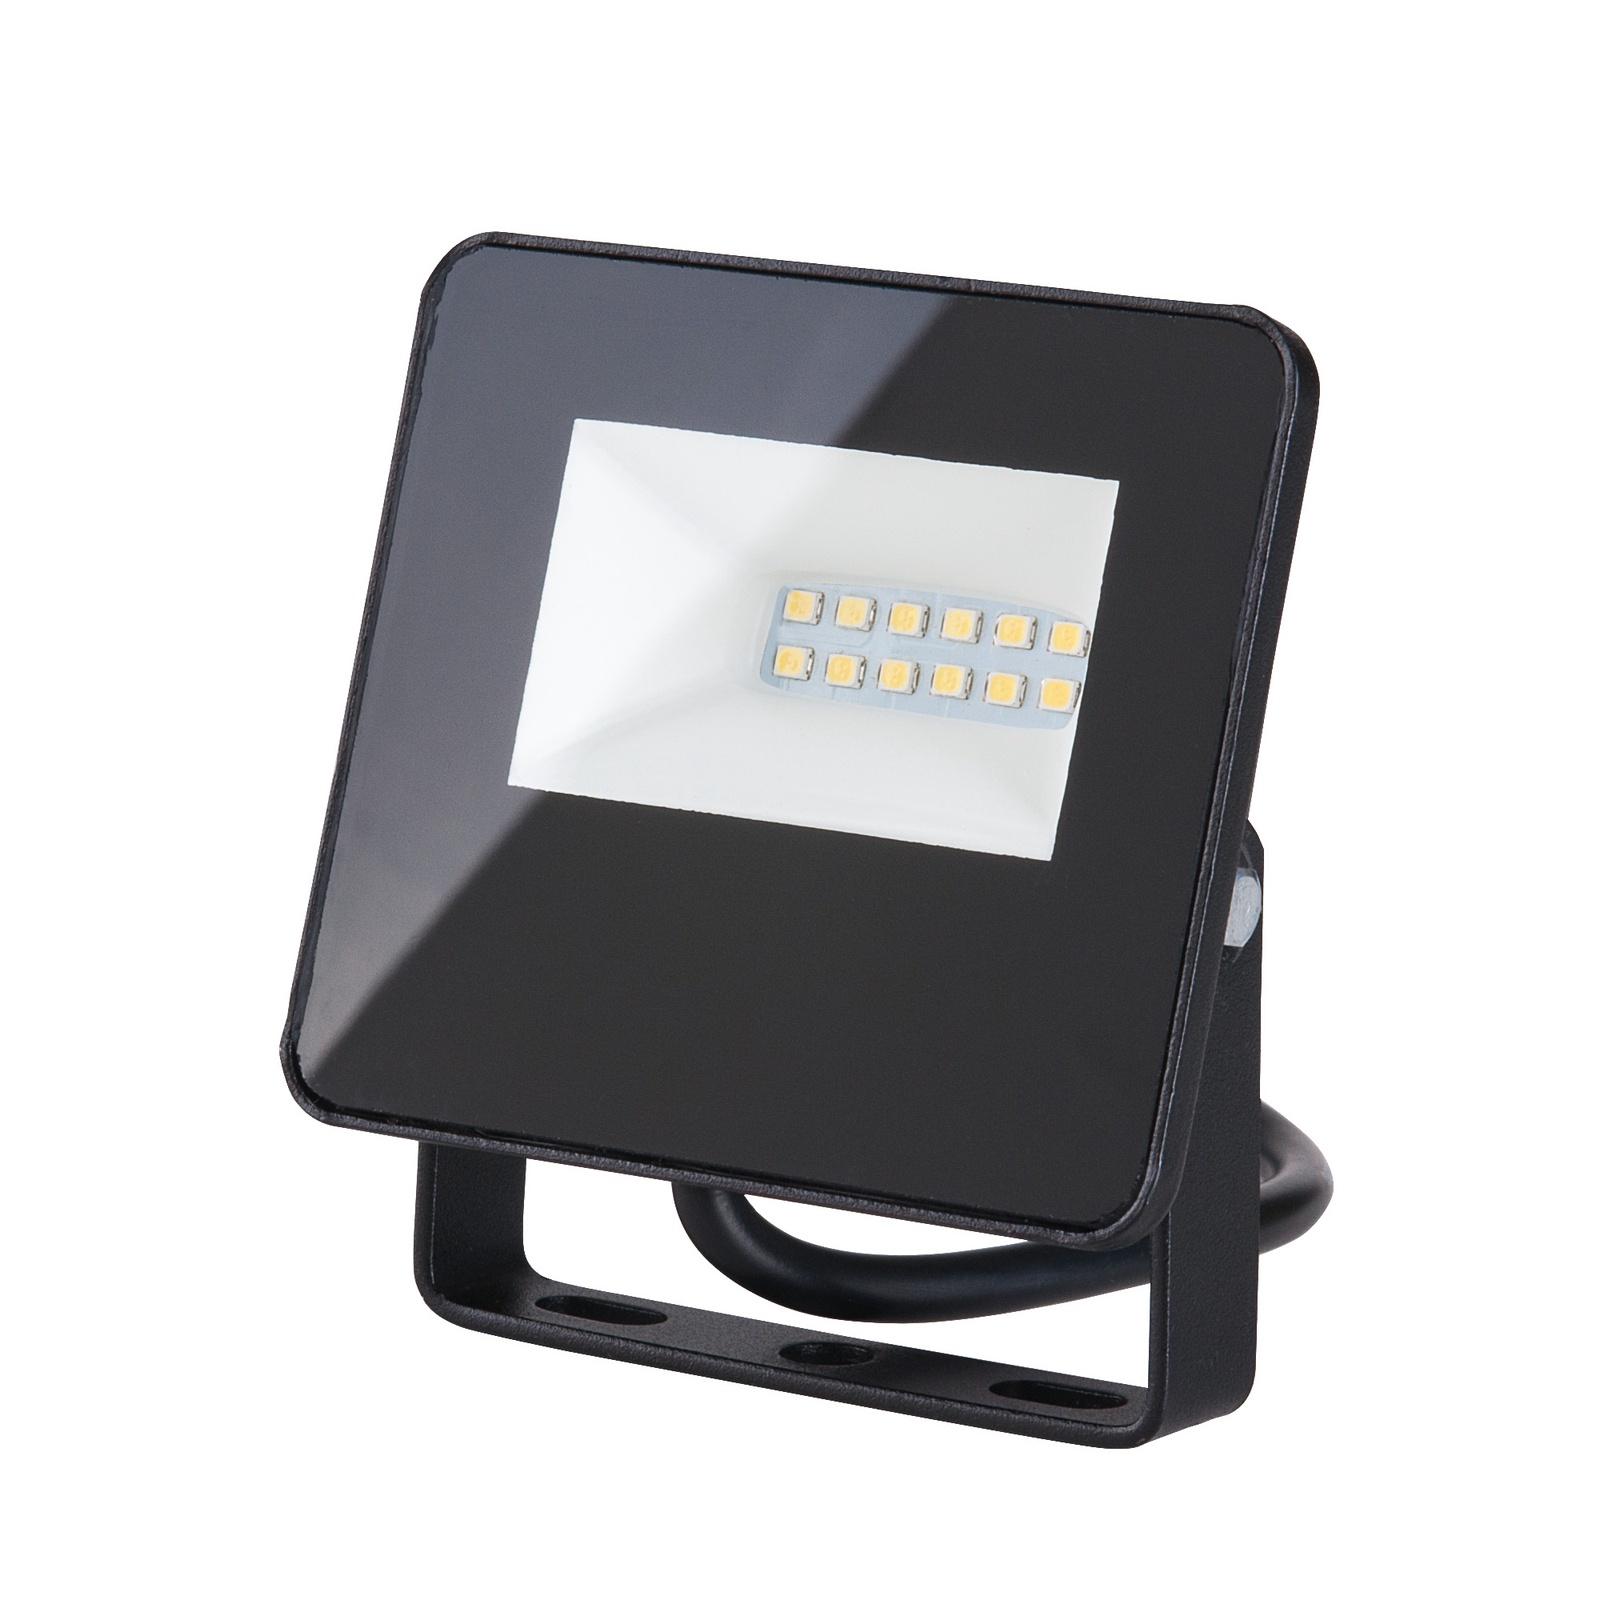 купить Прожектор Elektrostandard светодиодный 010 FL LED 10W 6500K IP65, 6500, 10 Вт онлайн